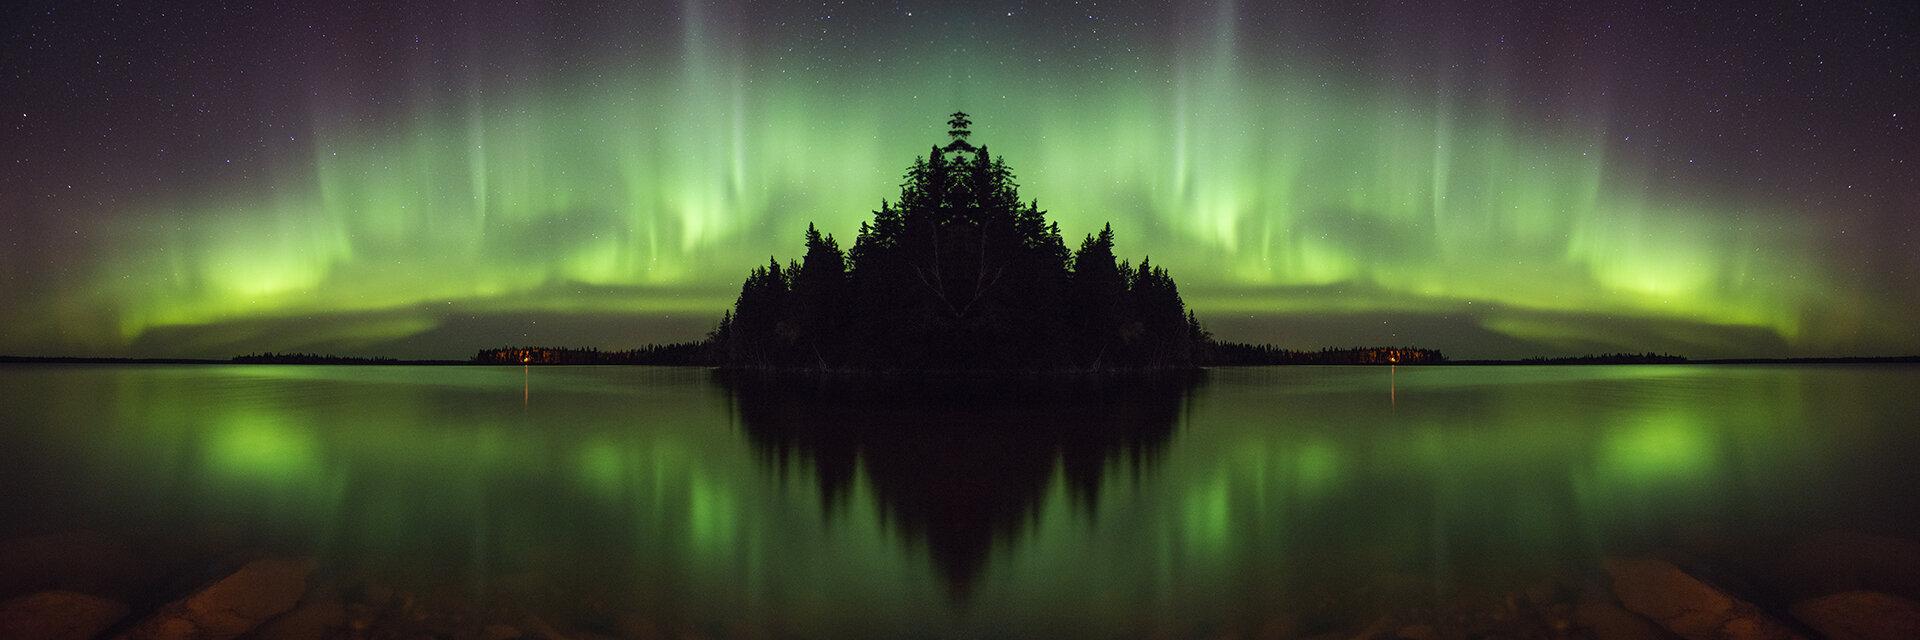 SK-Canada_DSC_8493AS_Aurora&Arcturus-Refelcted©JMacCausland_Zap.jpg